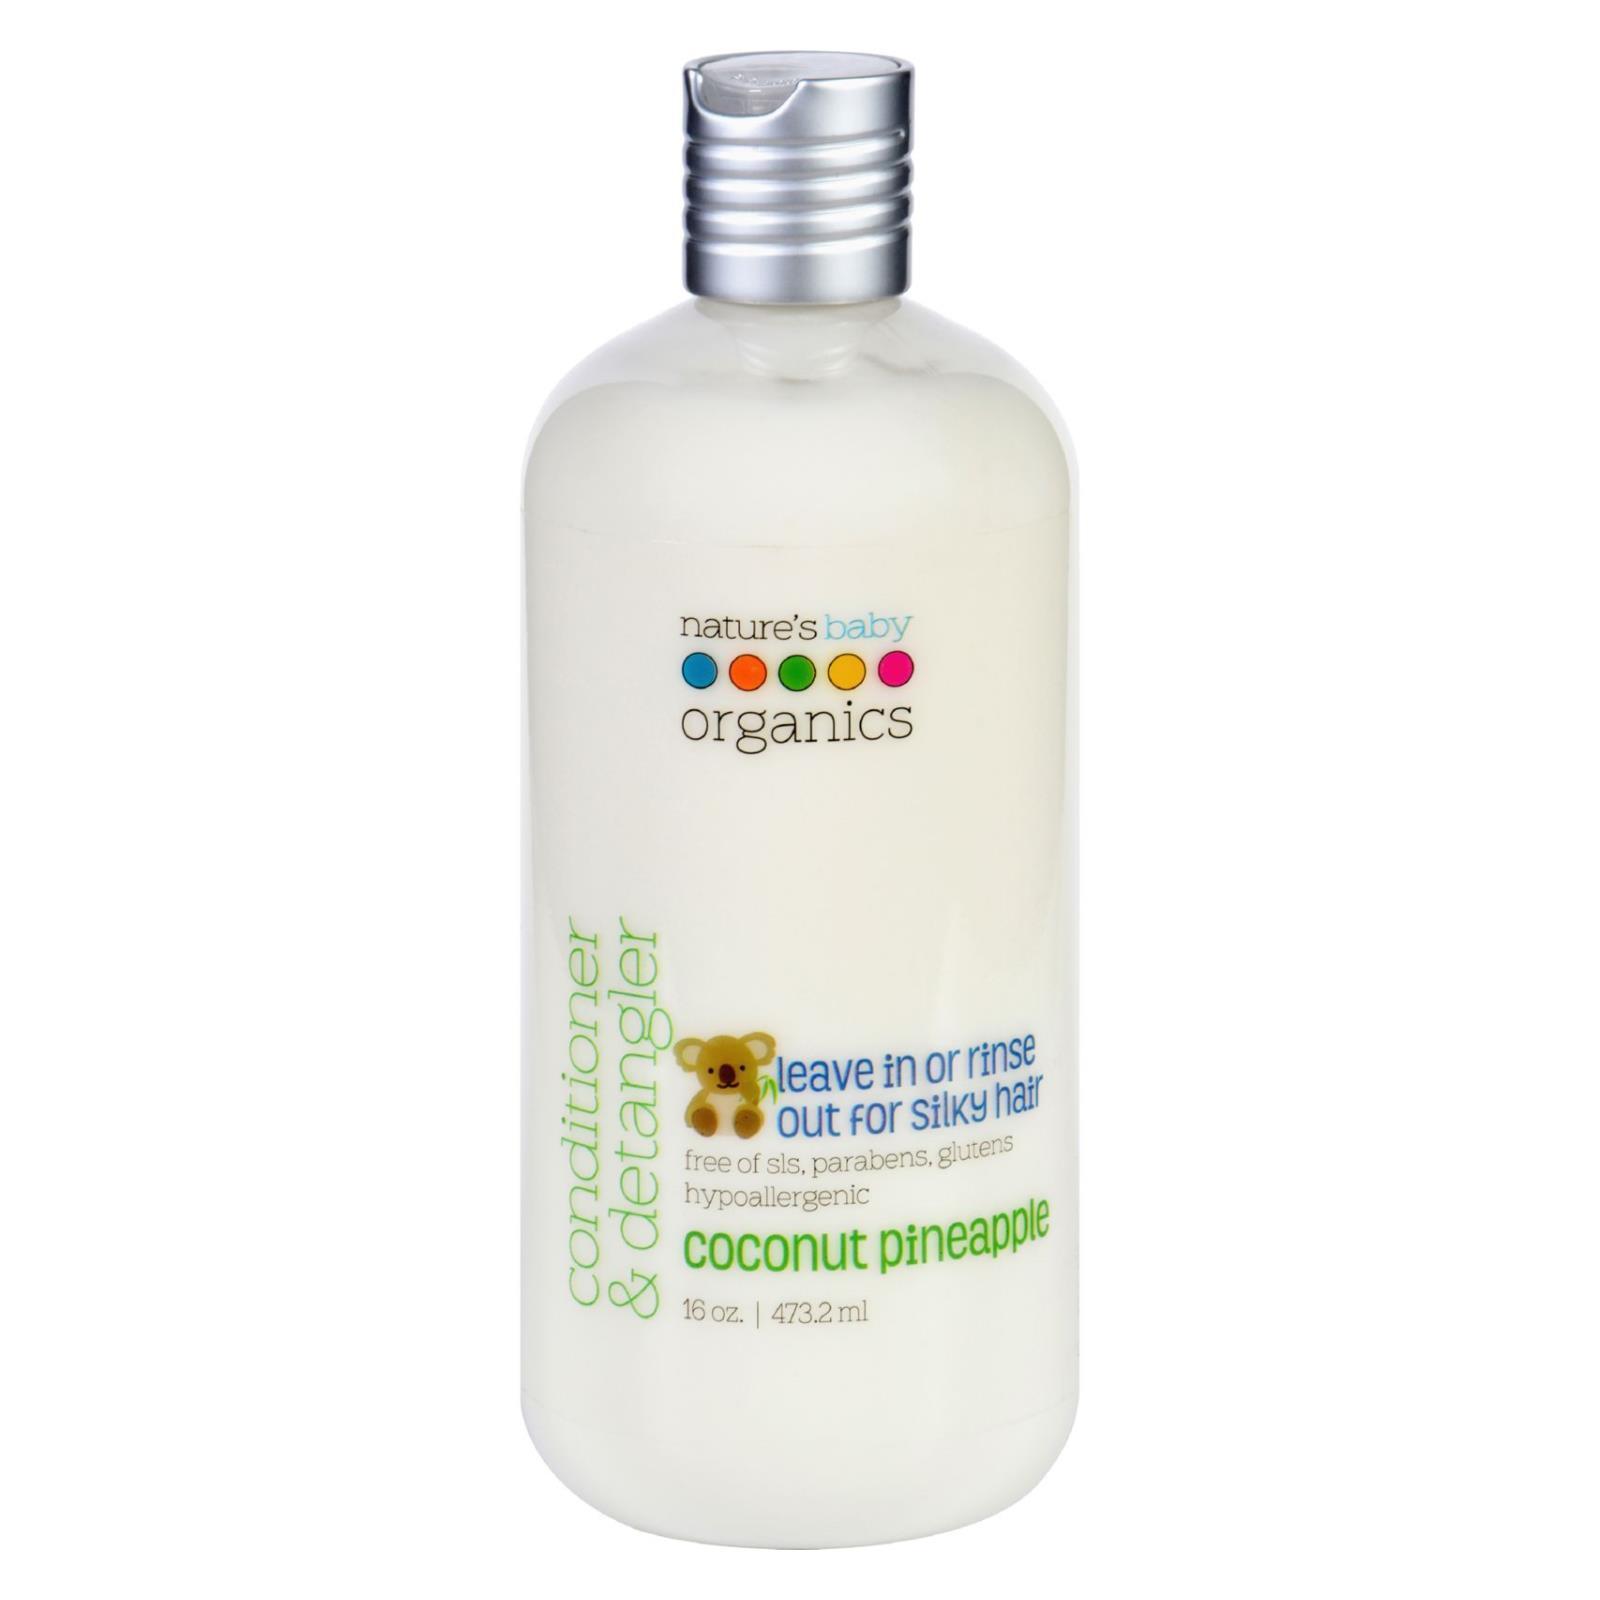 Nature's Baby Organics Conditioner and Detangler - Coconut Pineapple - 16 oz